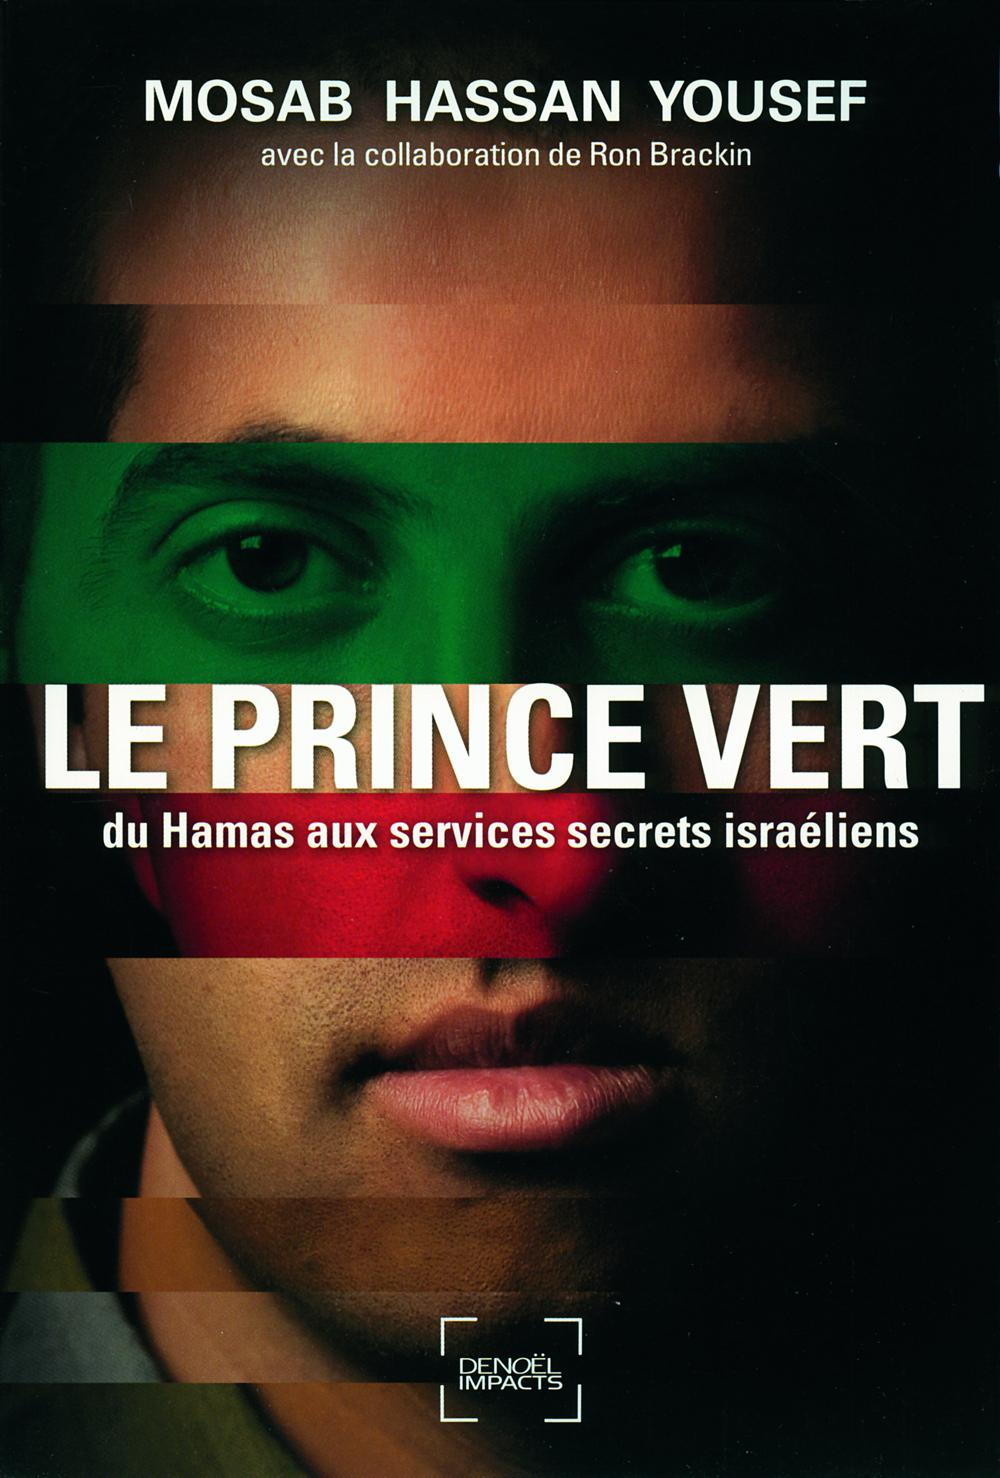 Le Prince vert